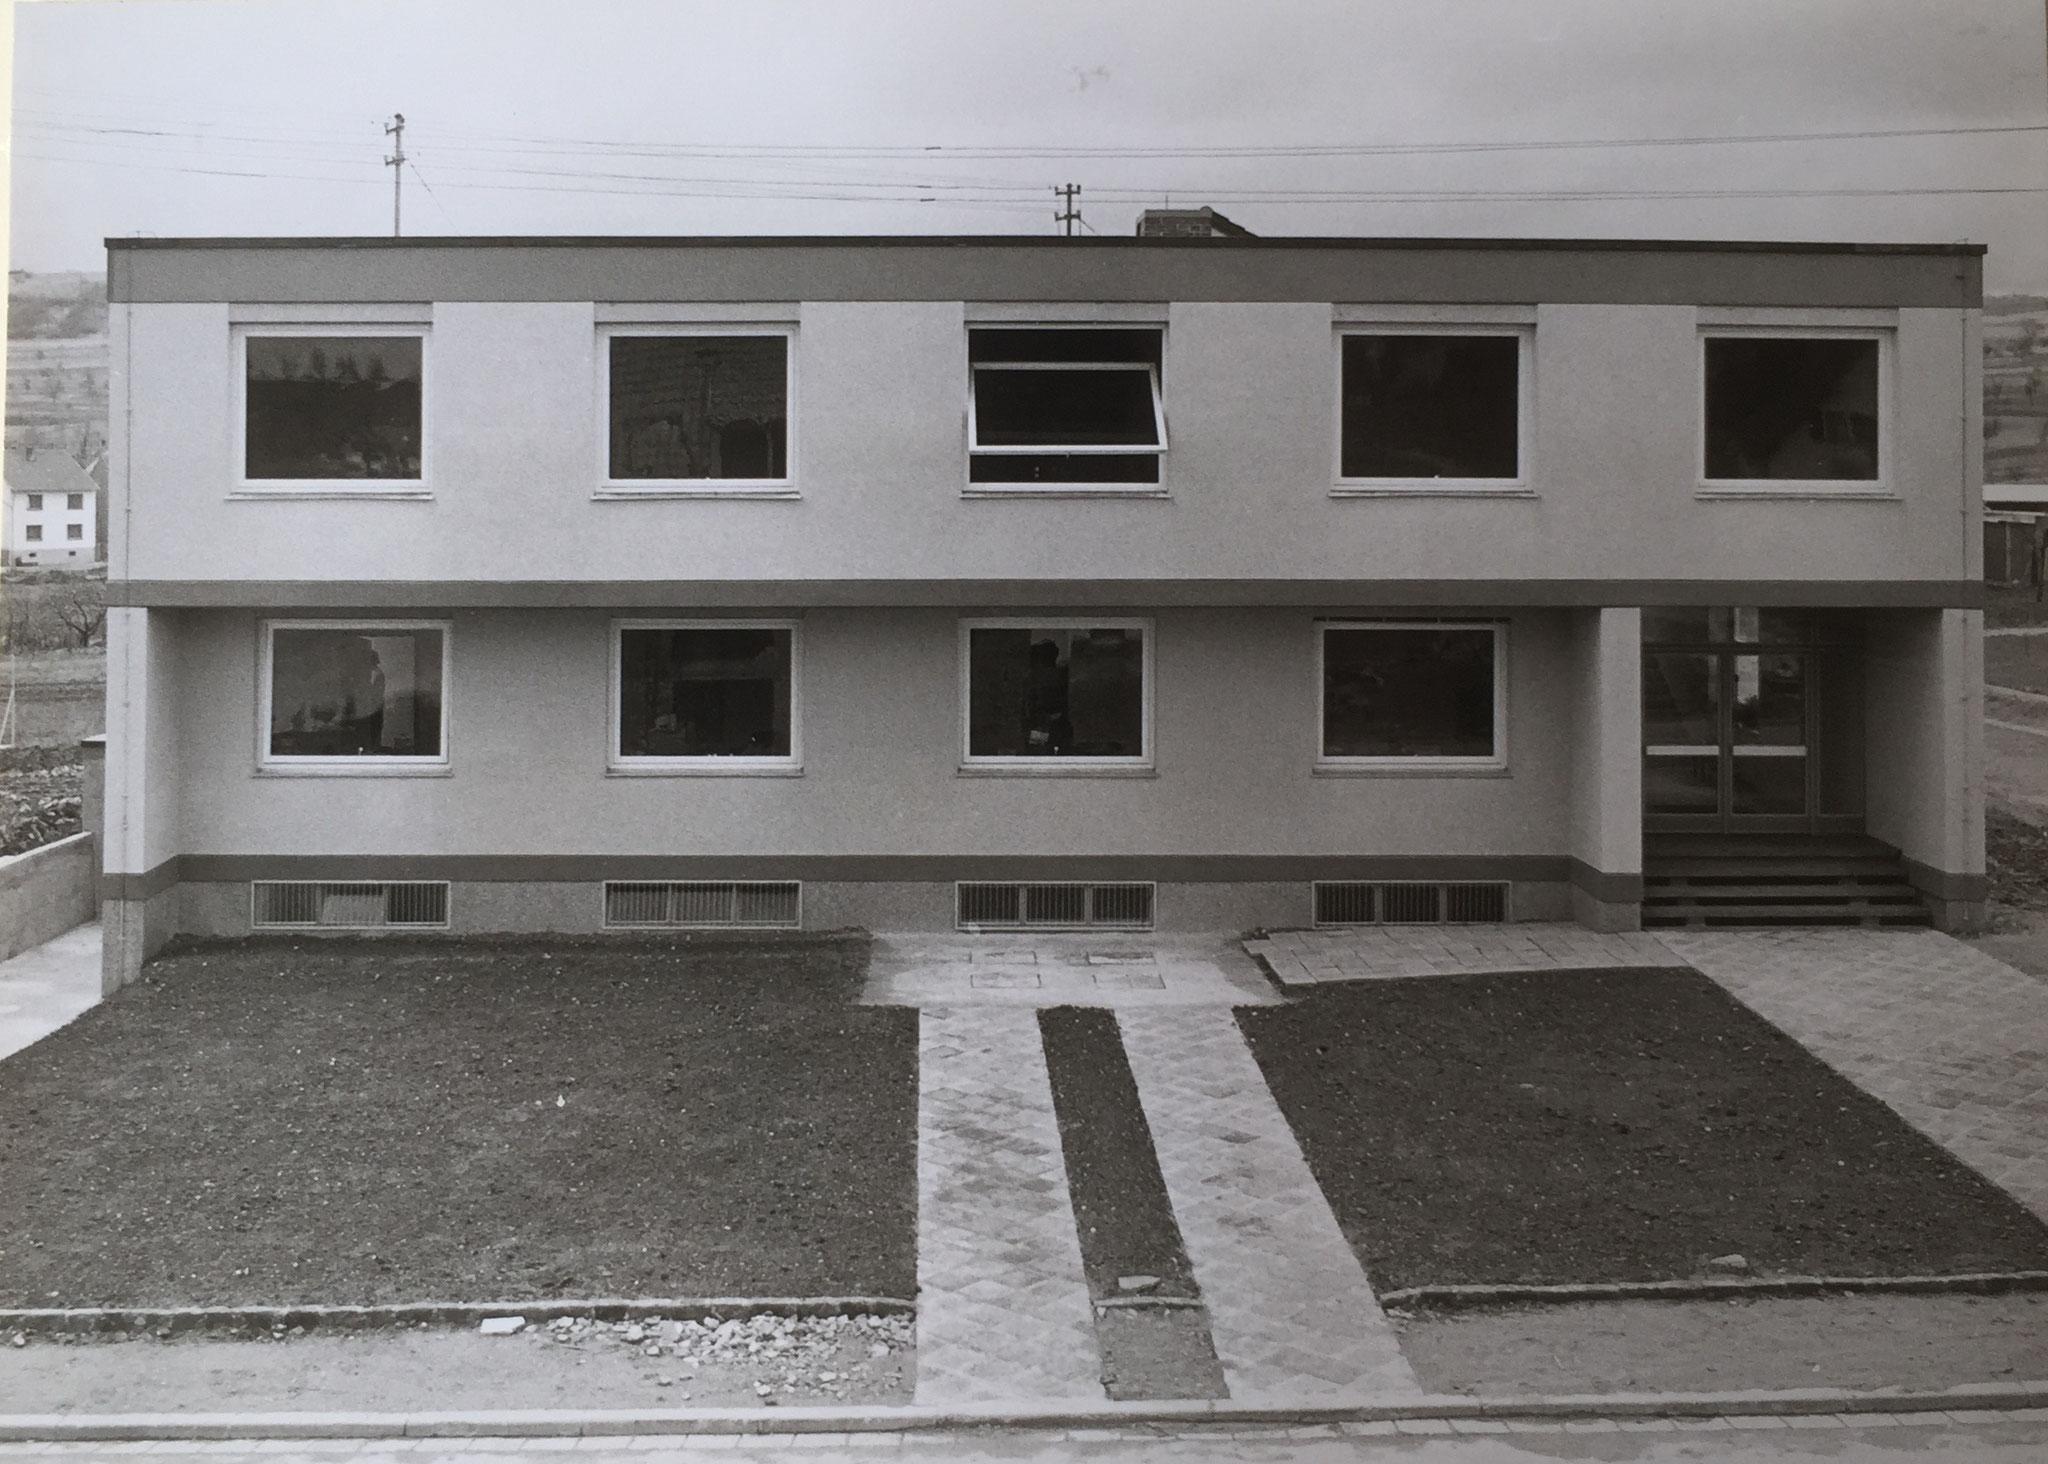 Rathauseinweihung am 10. November 1963